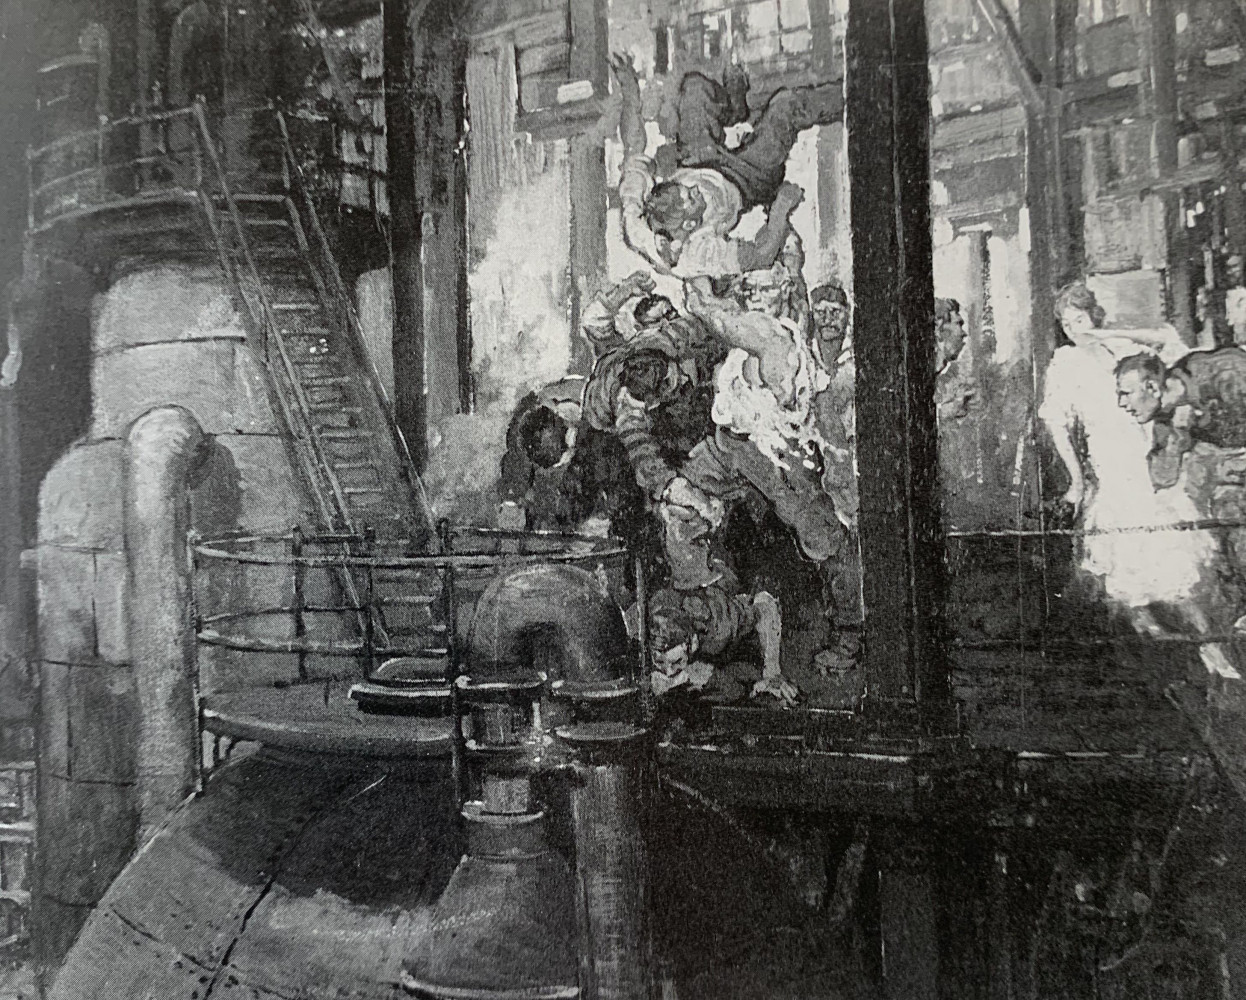 The Brawl by Henry James Soulen